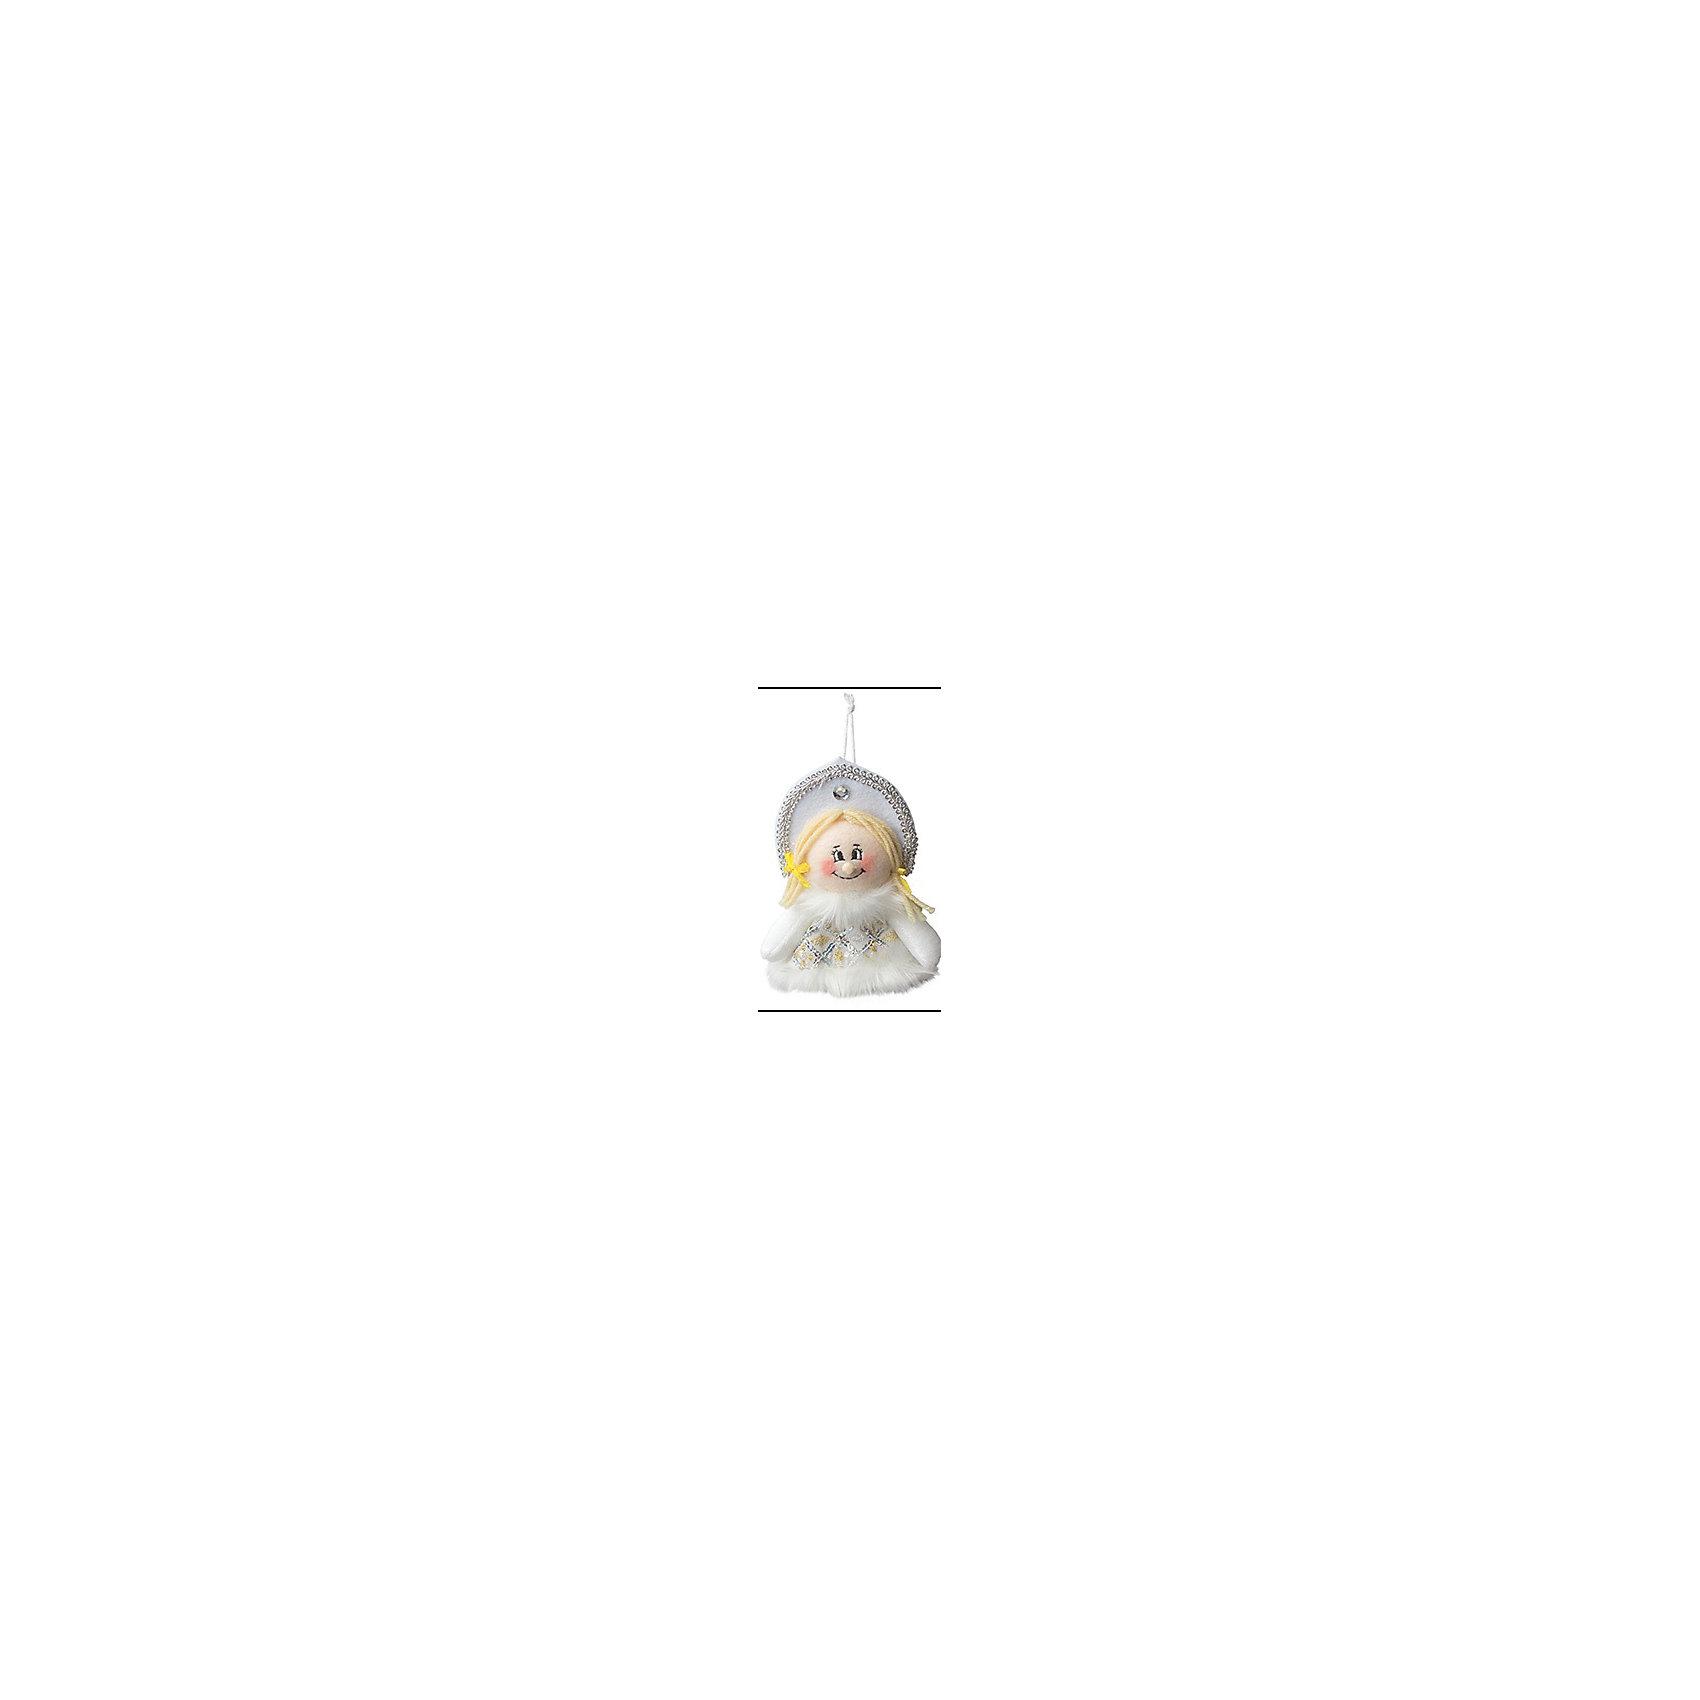 Marko Ferenzo Украшение Снегурочка 18 см, серебро елочное украшение носок marko ferenzo